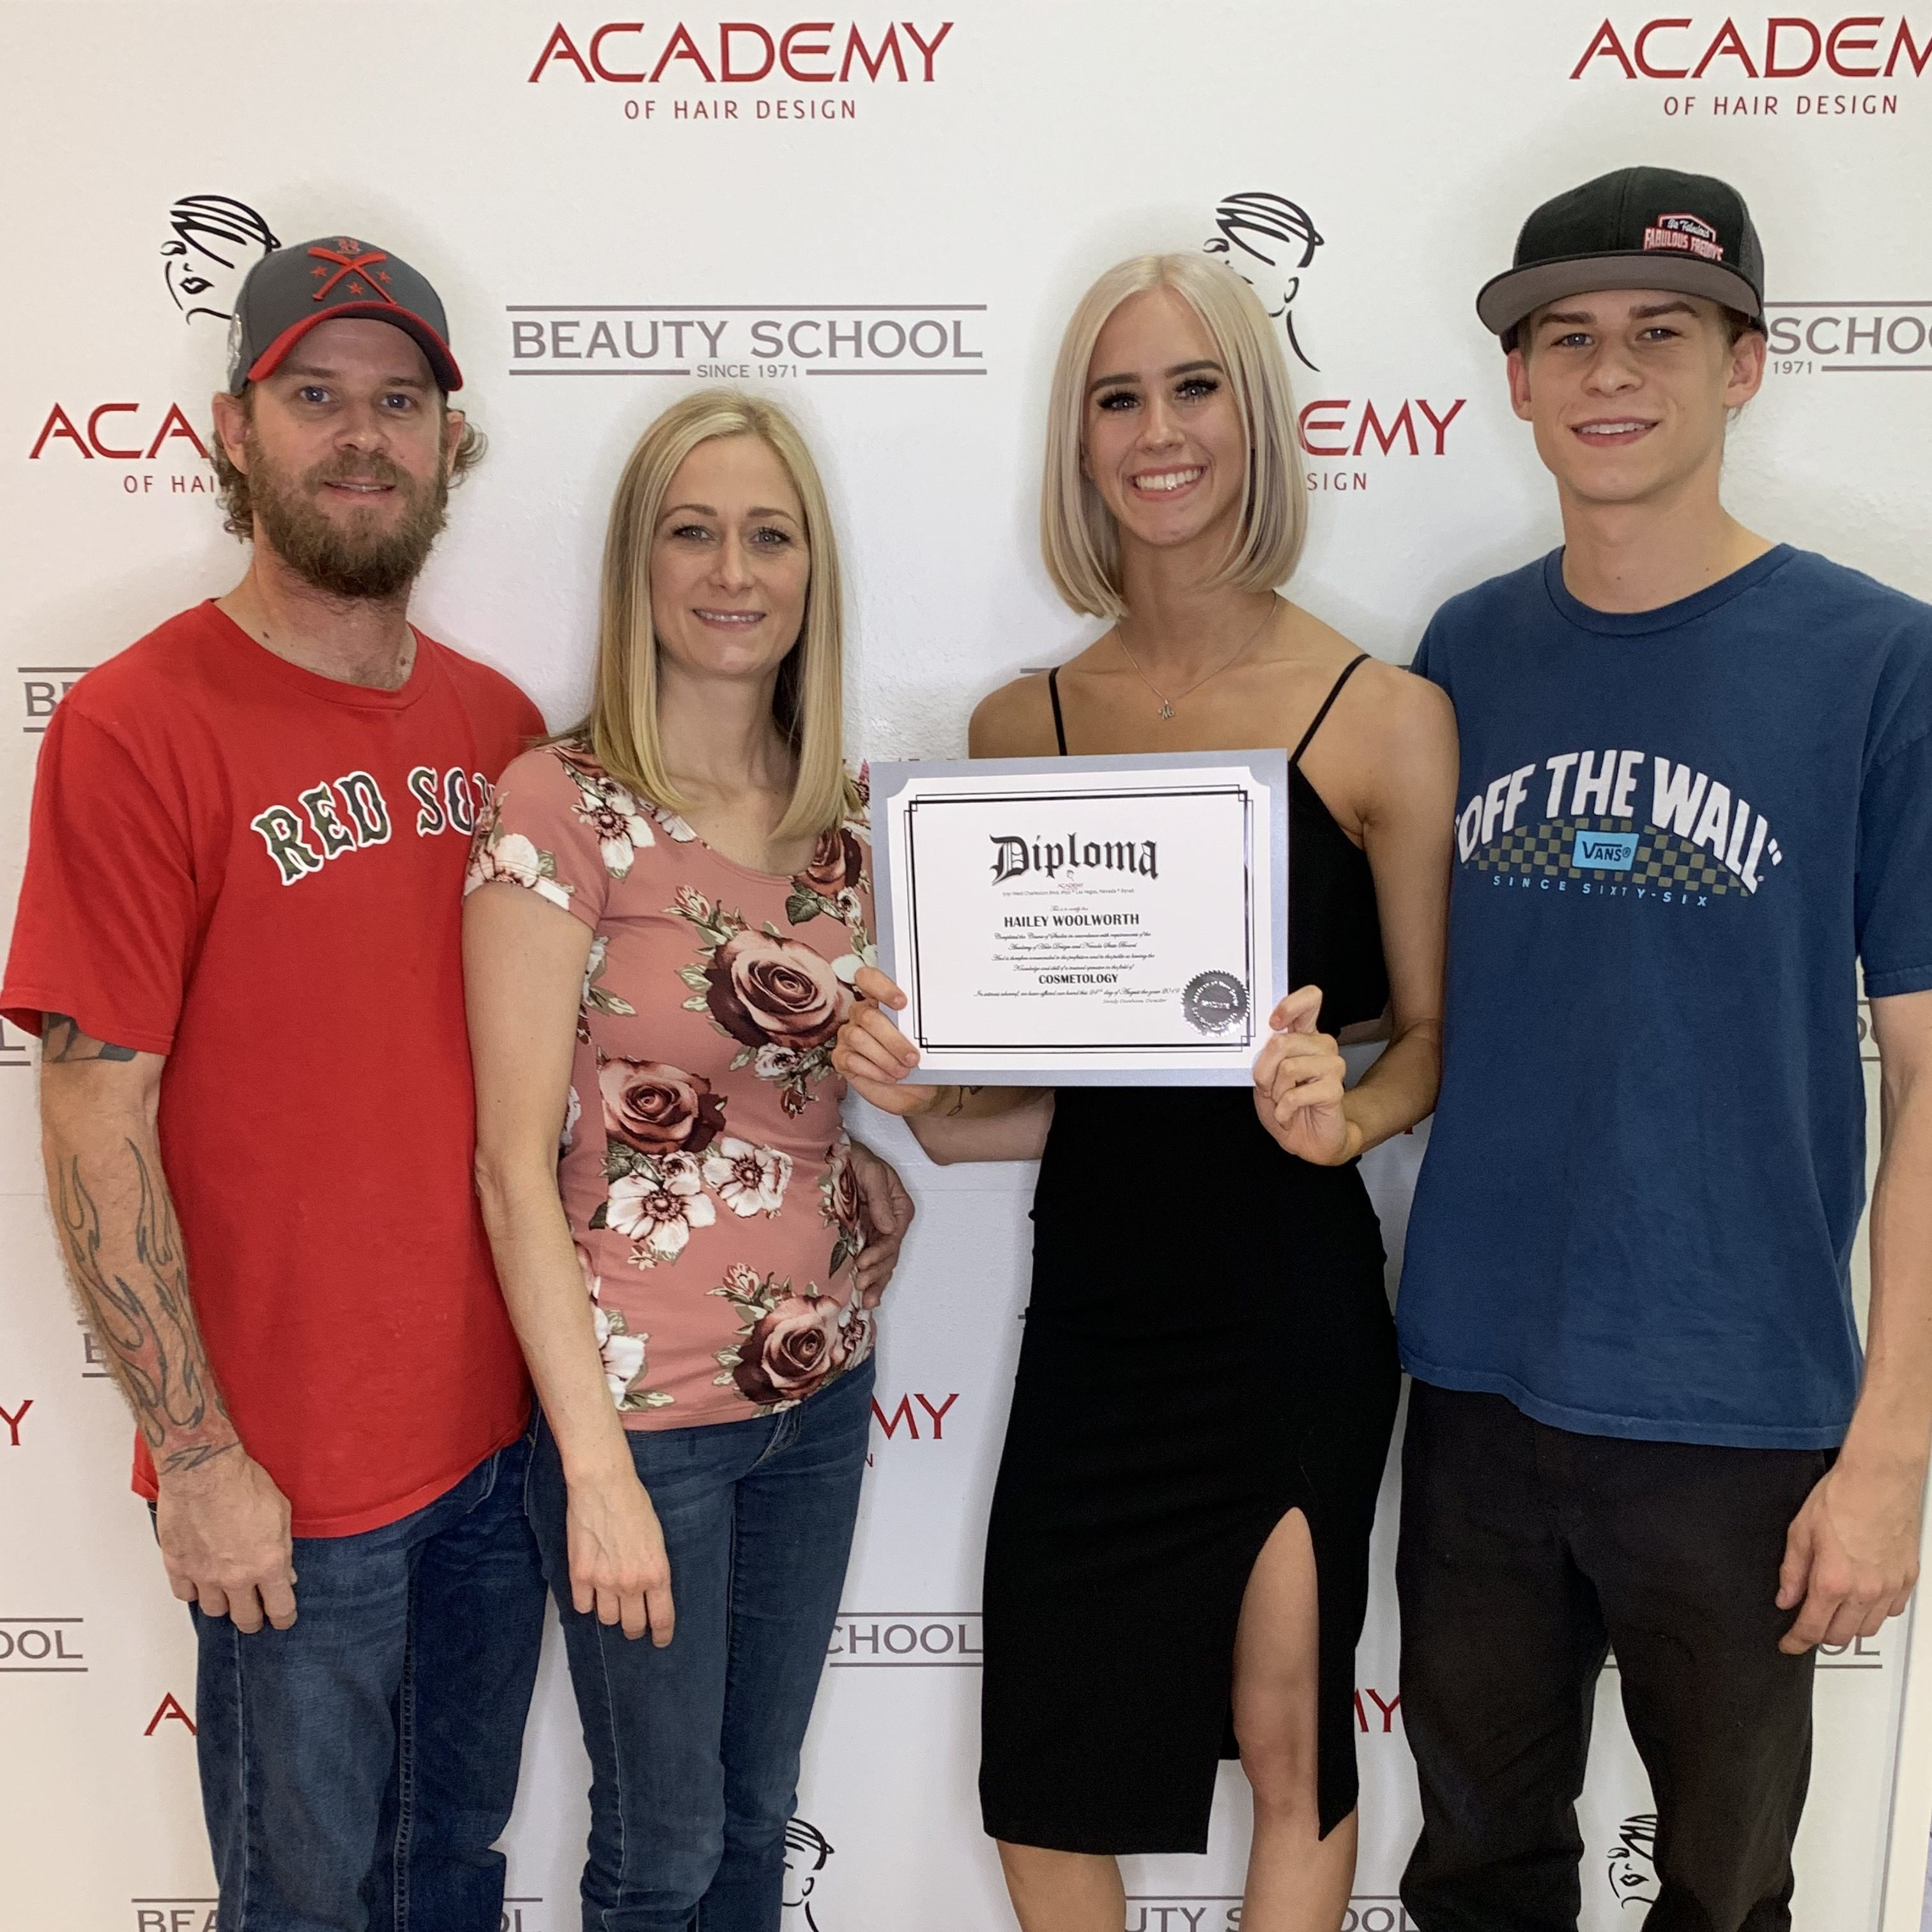 Hailey Woolworth The Hair Standard Las Vegas Cosmetology School Graduation